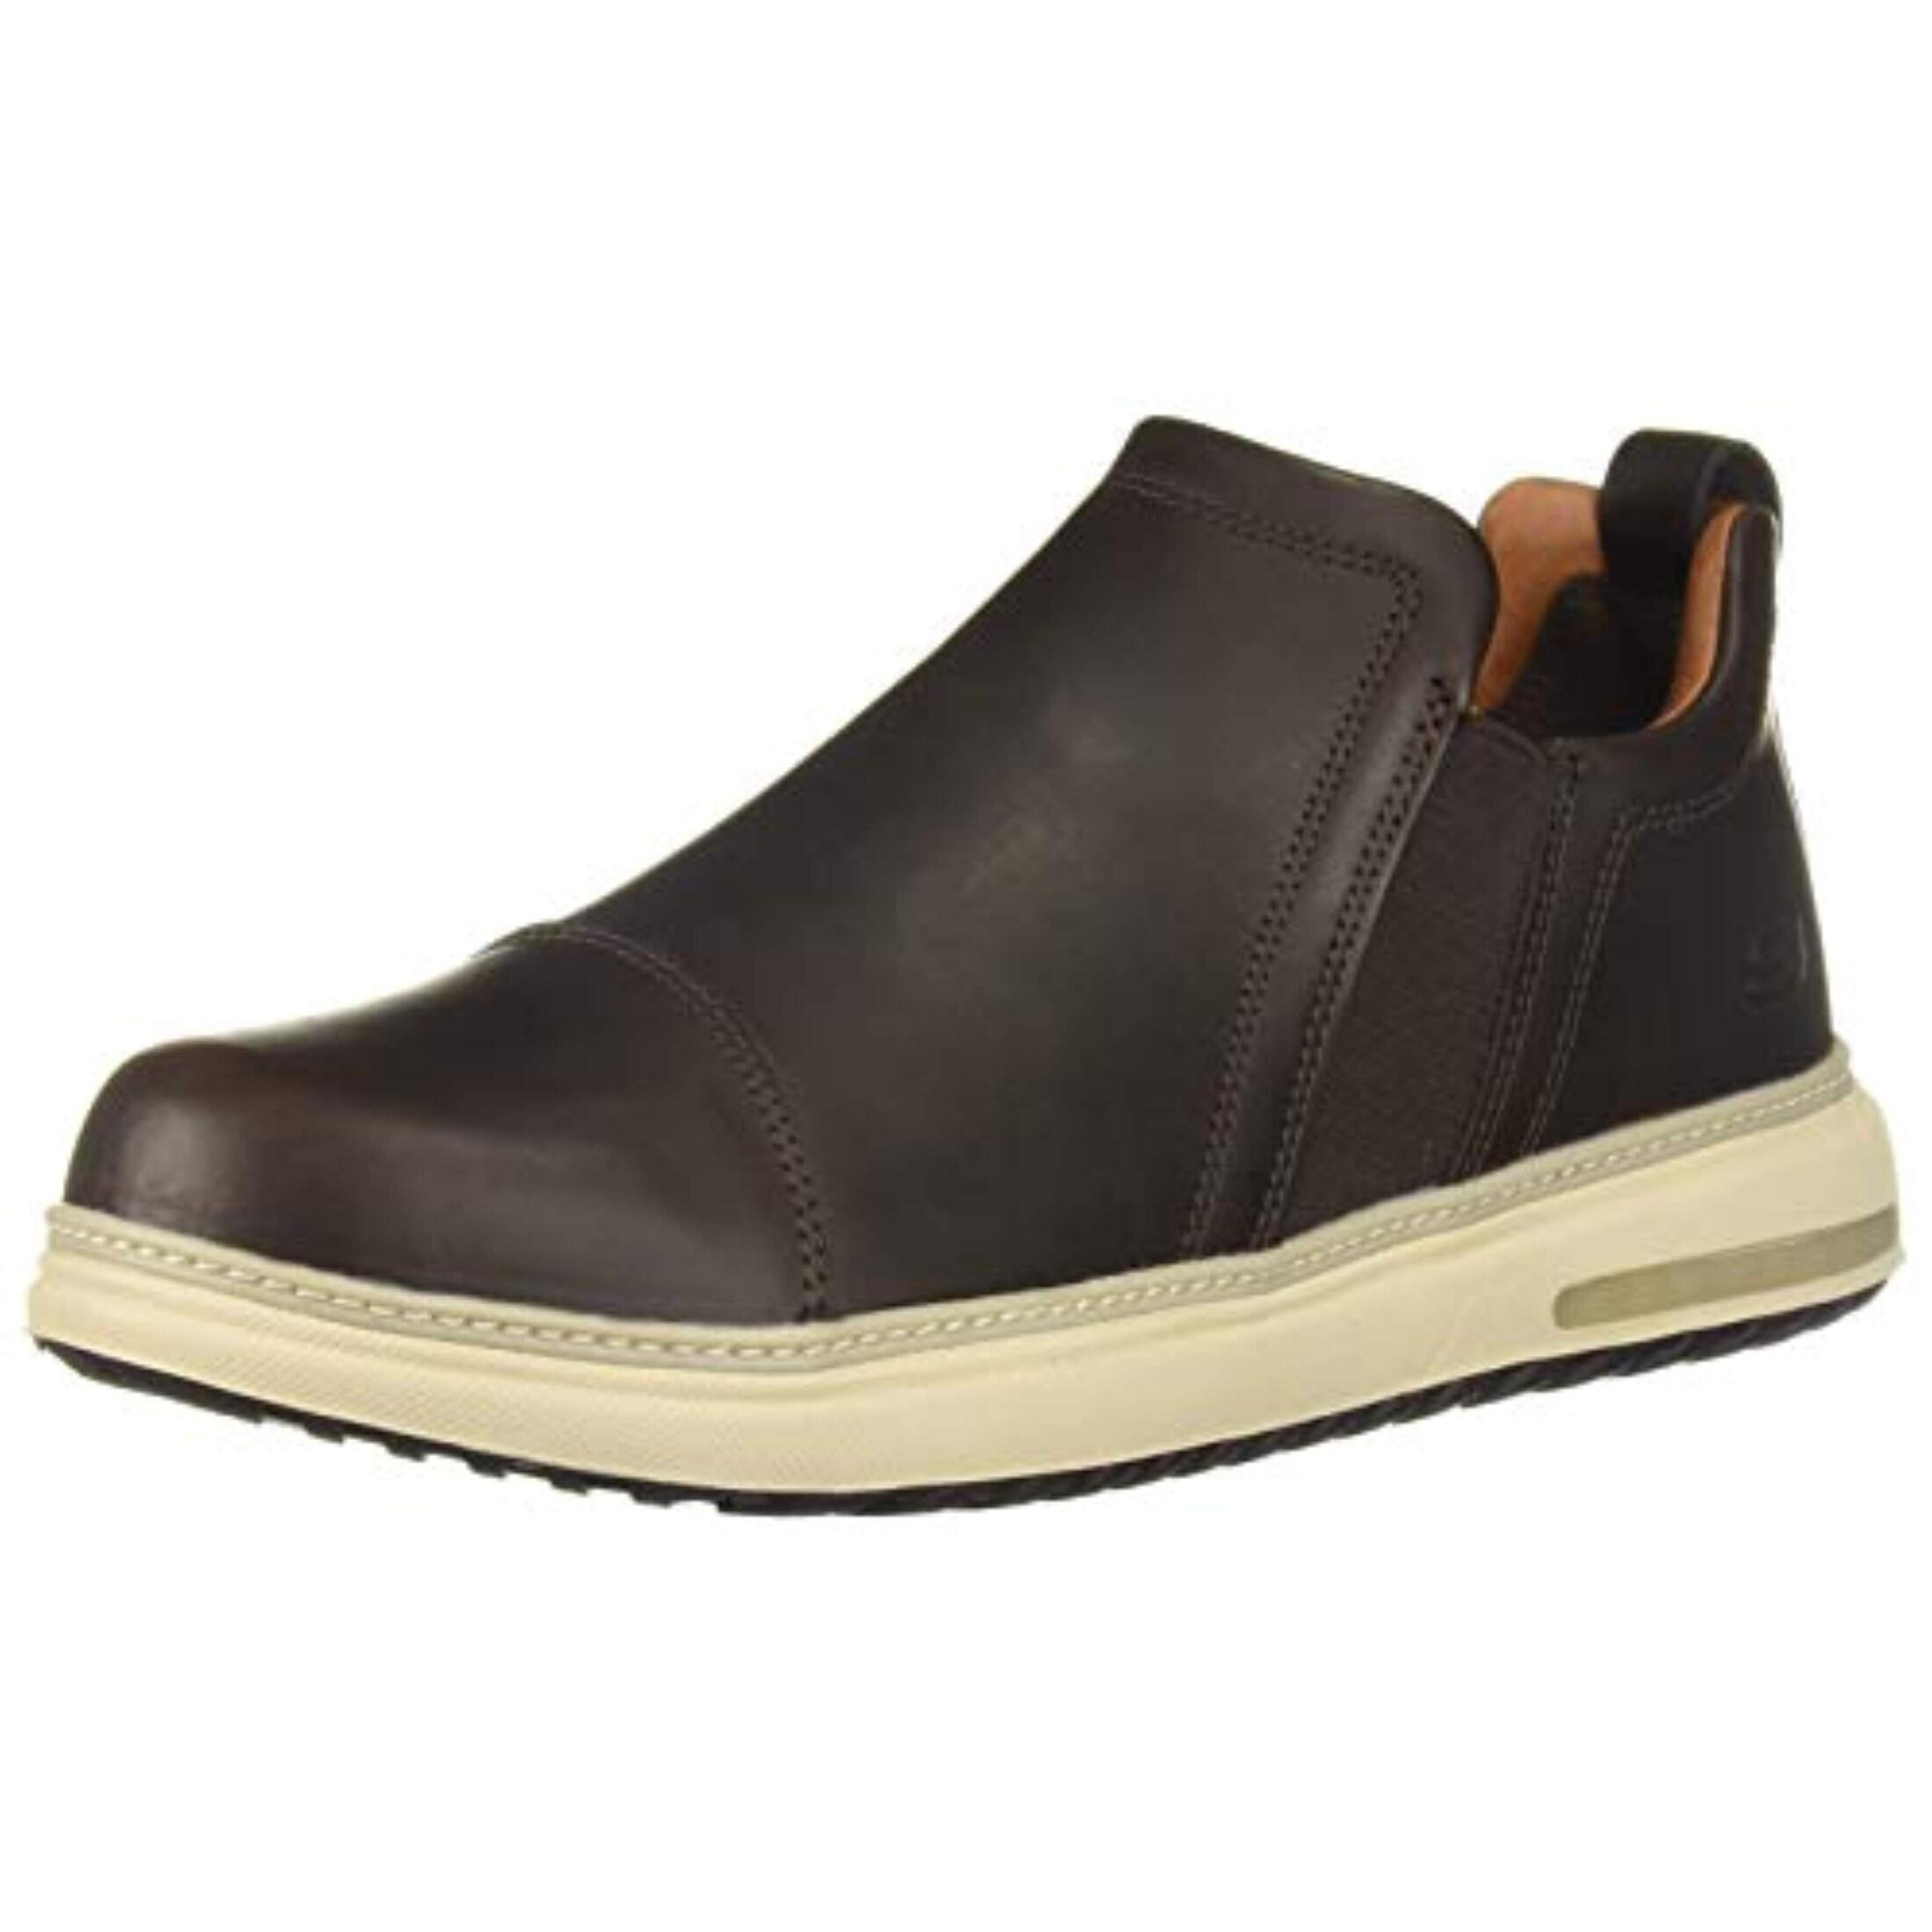 Experimentar puramente Haz un experimento  Skechers Men's Folten-Orego Chelsea Boot, Chocolate - Overstock - 27122079